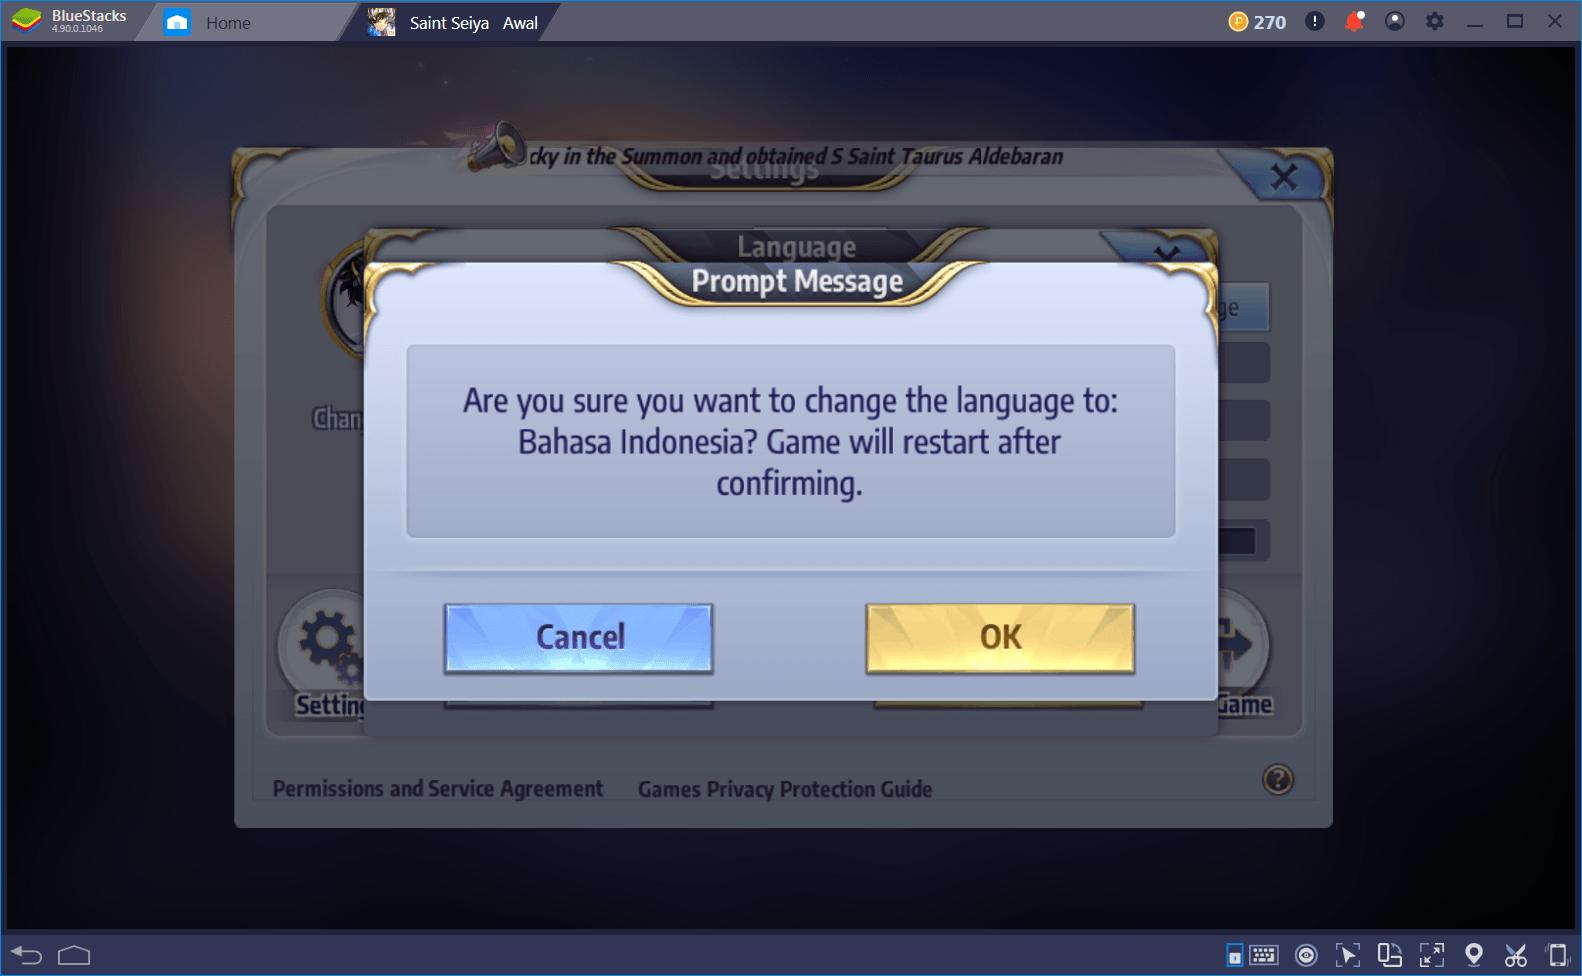 Cara bermain Saint Seiya: Awakening di PC